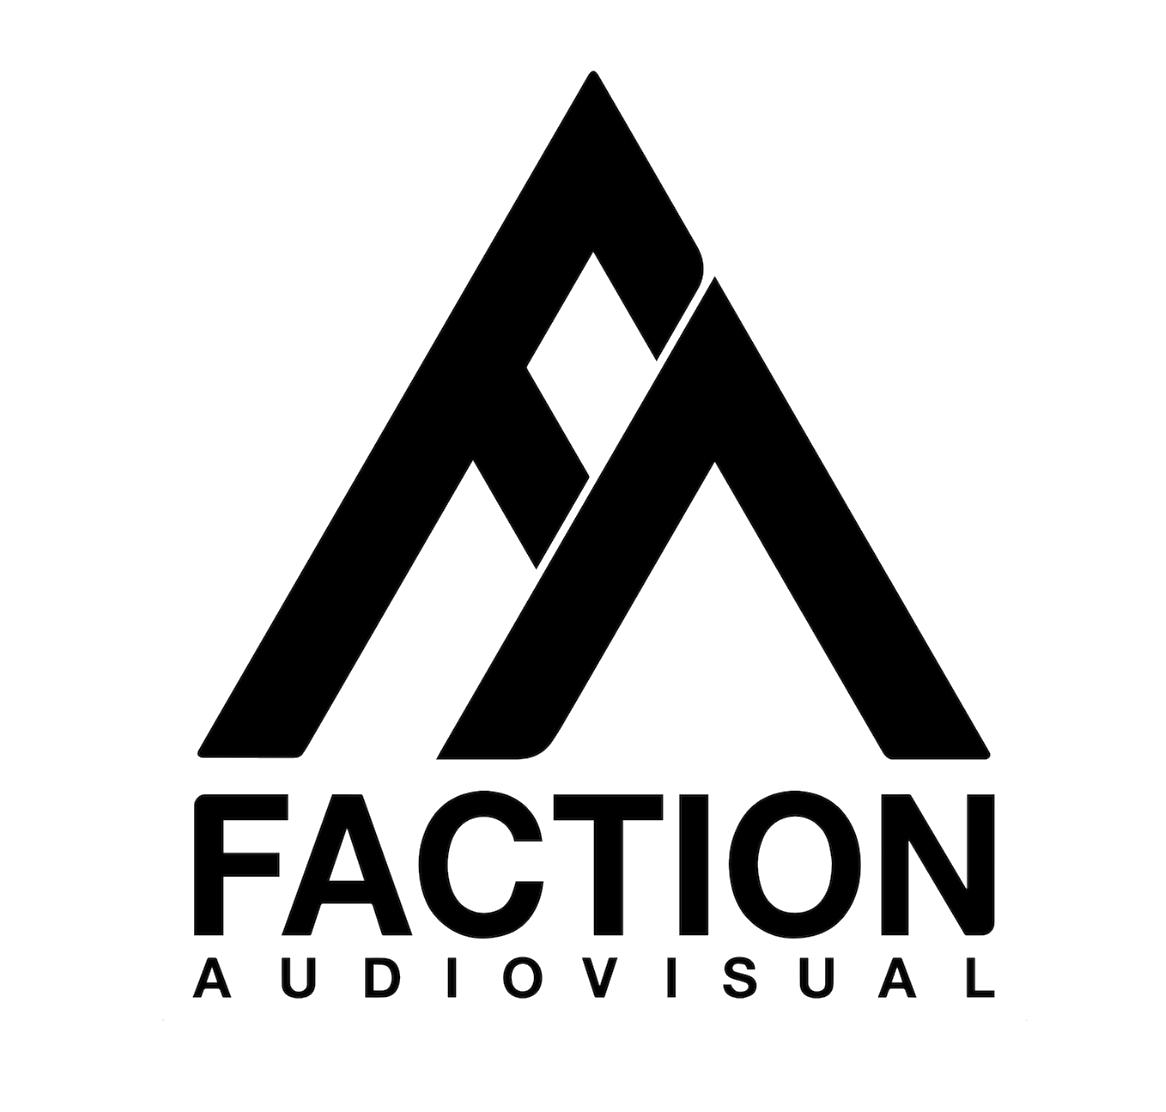 Faction_Audiovisual_Logo